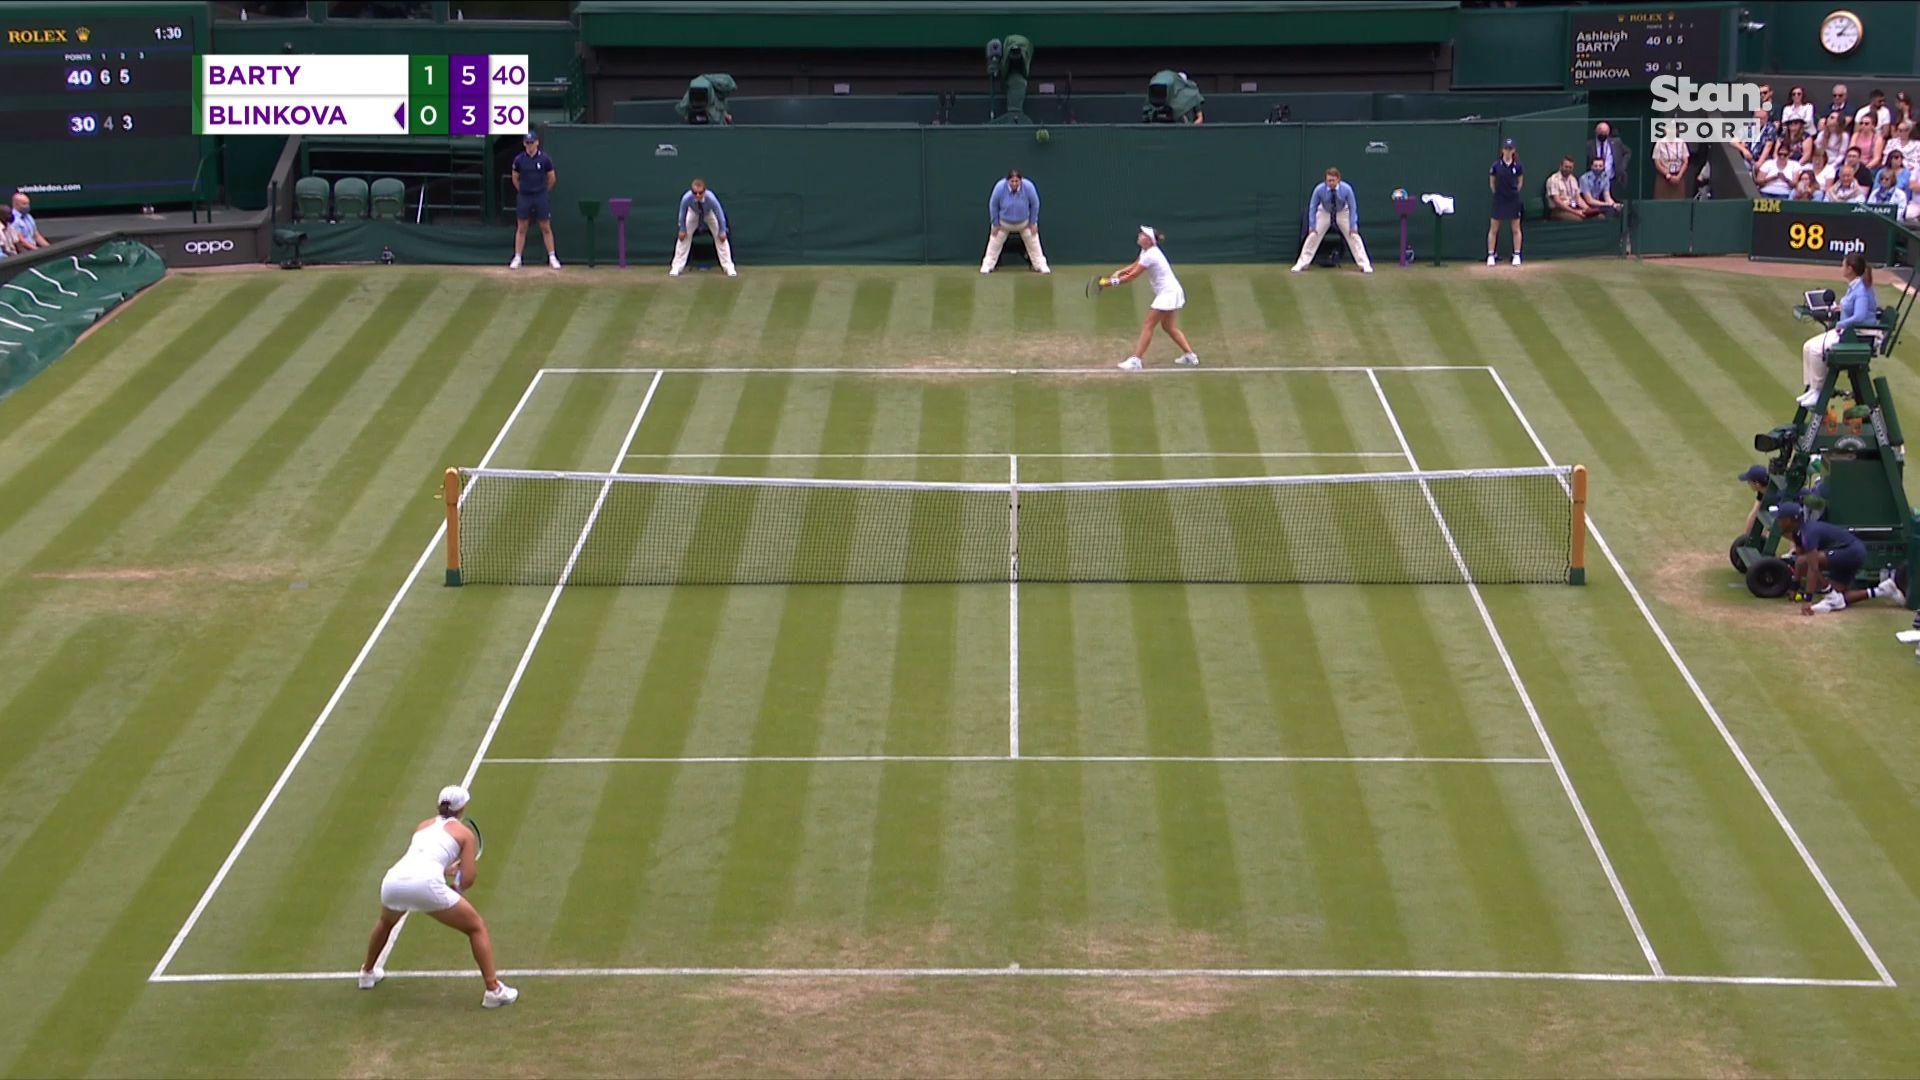 Wimbledon 2021: 'Sloppy' Ash Barty avoids upset trend to reach third round at Wimbledon